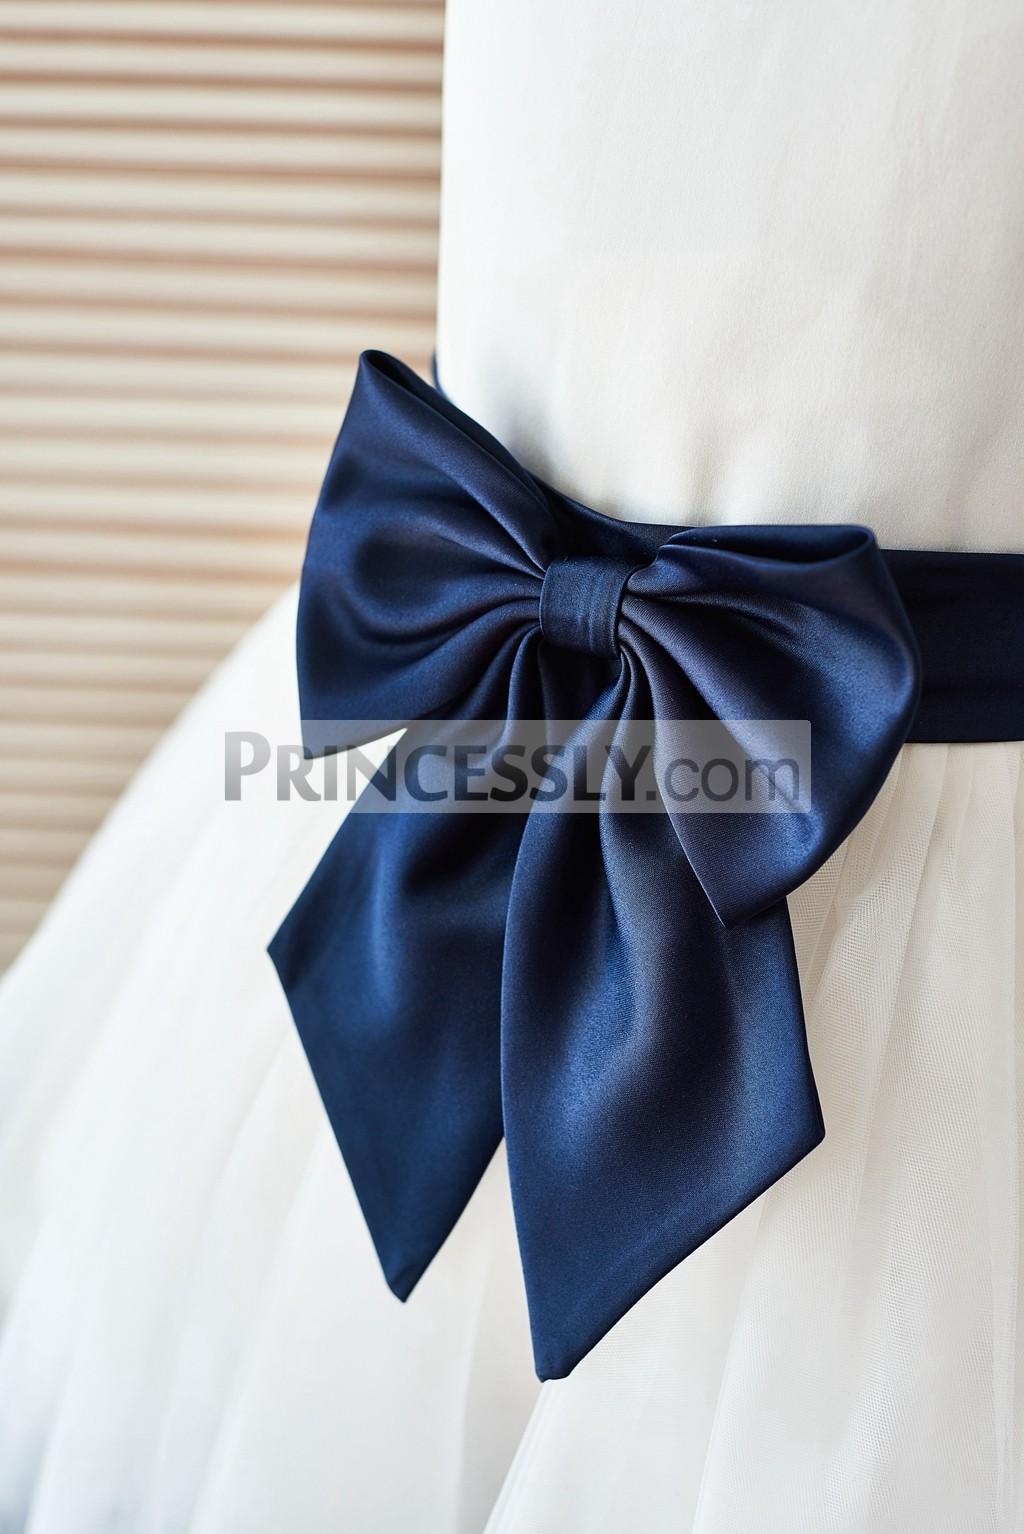 Navy blue satin sash and bow